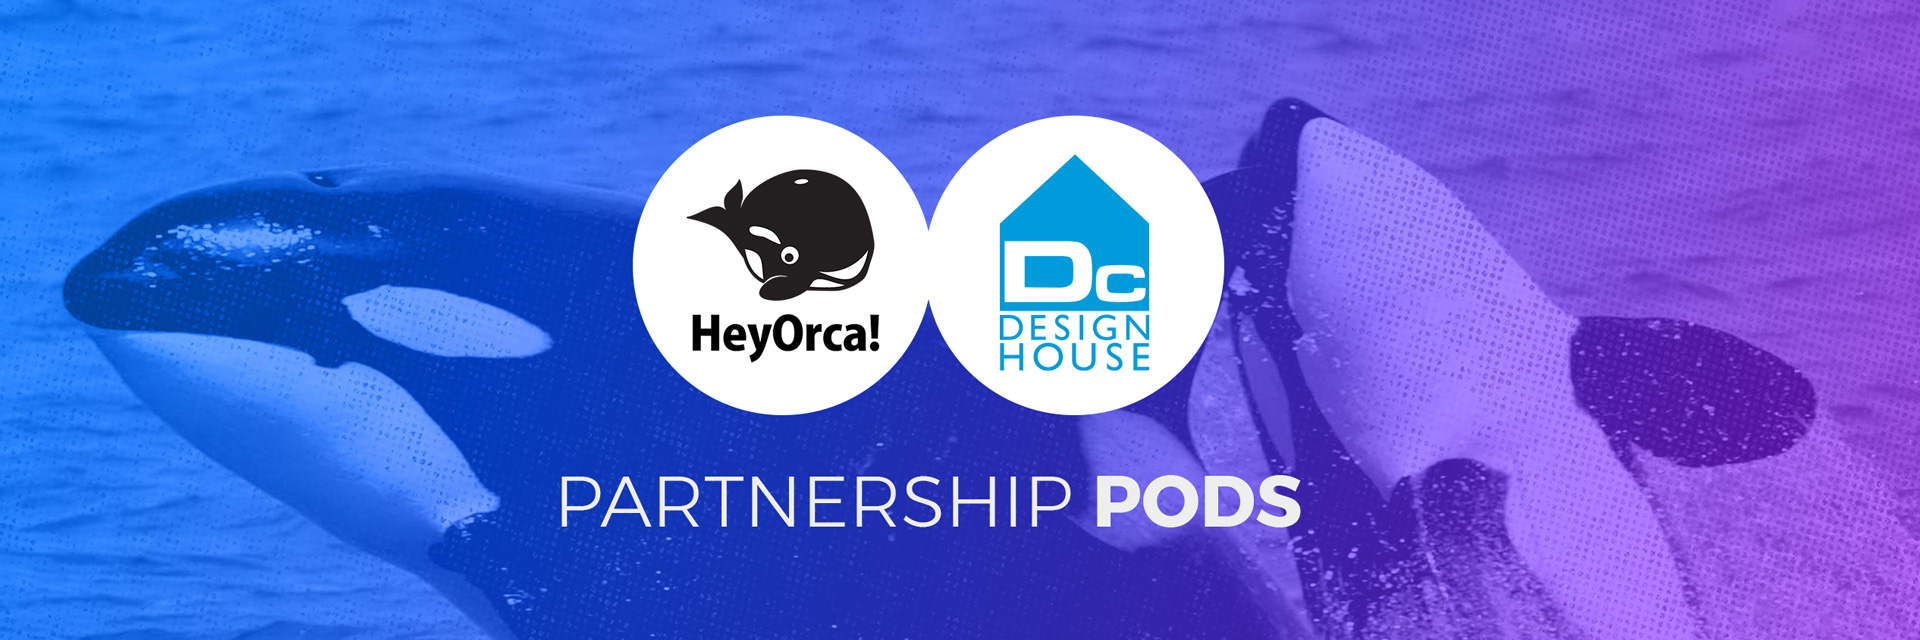 Partnership Pods: HeyOrca